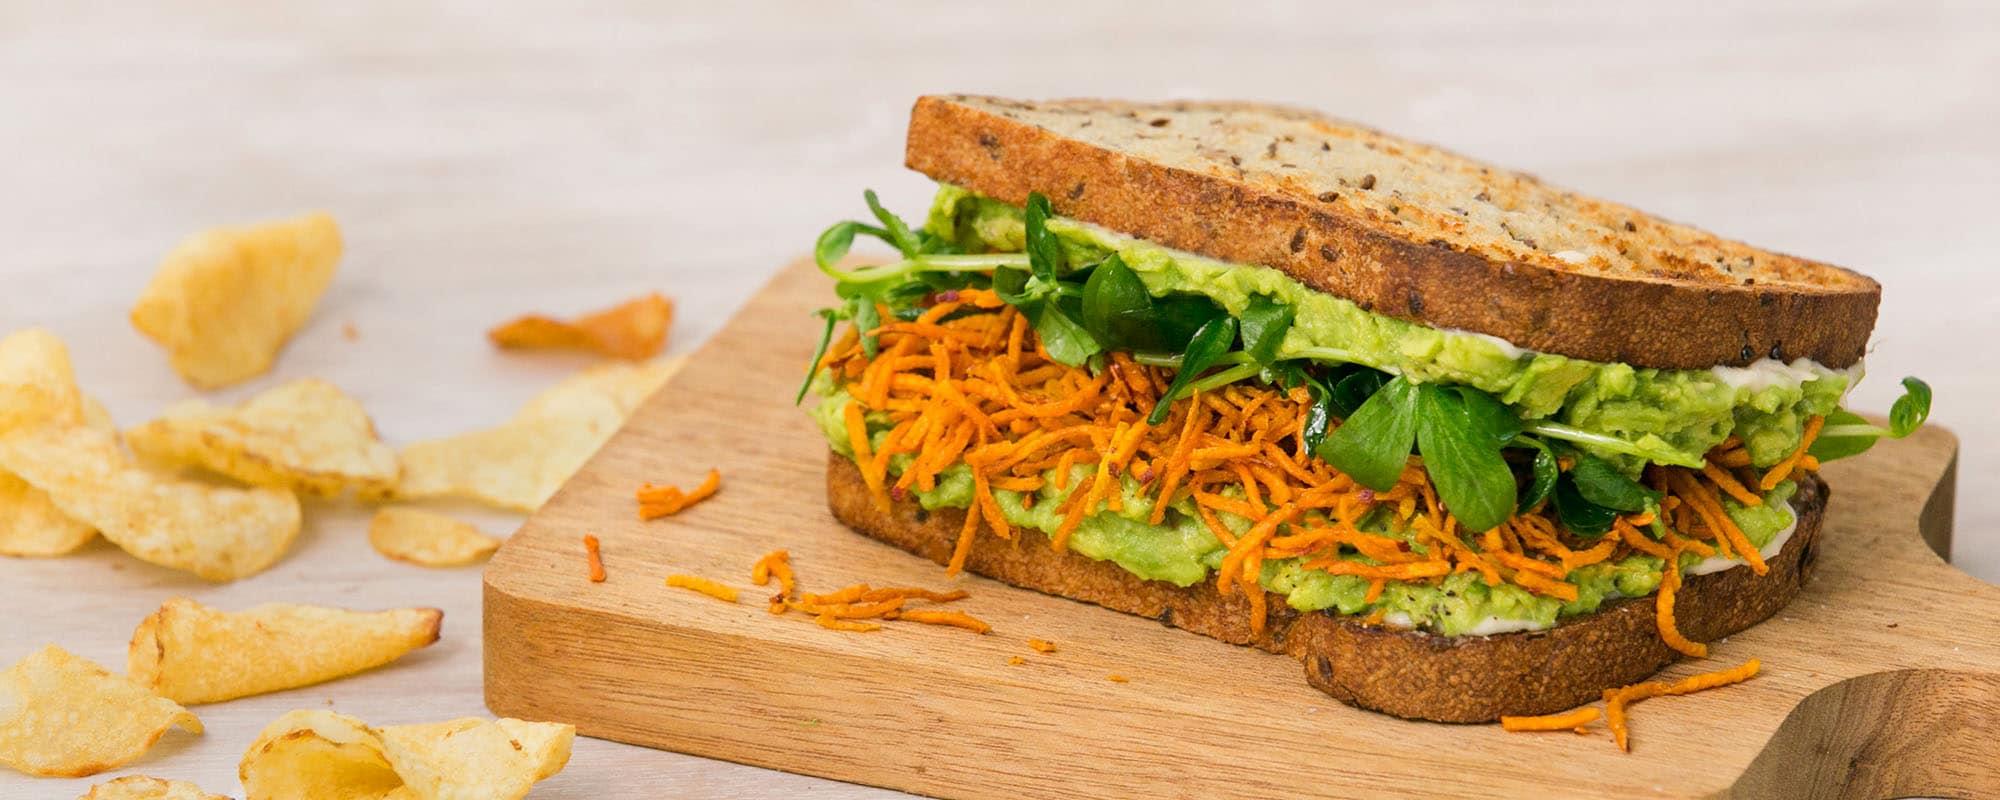 Vegan Hippy Sandwich